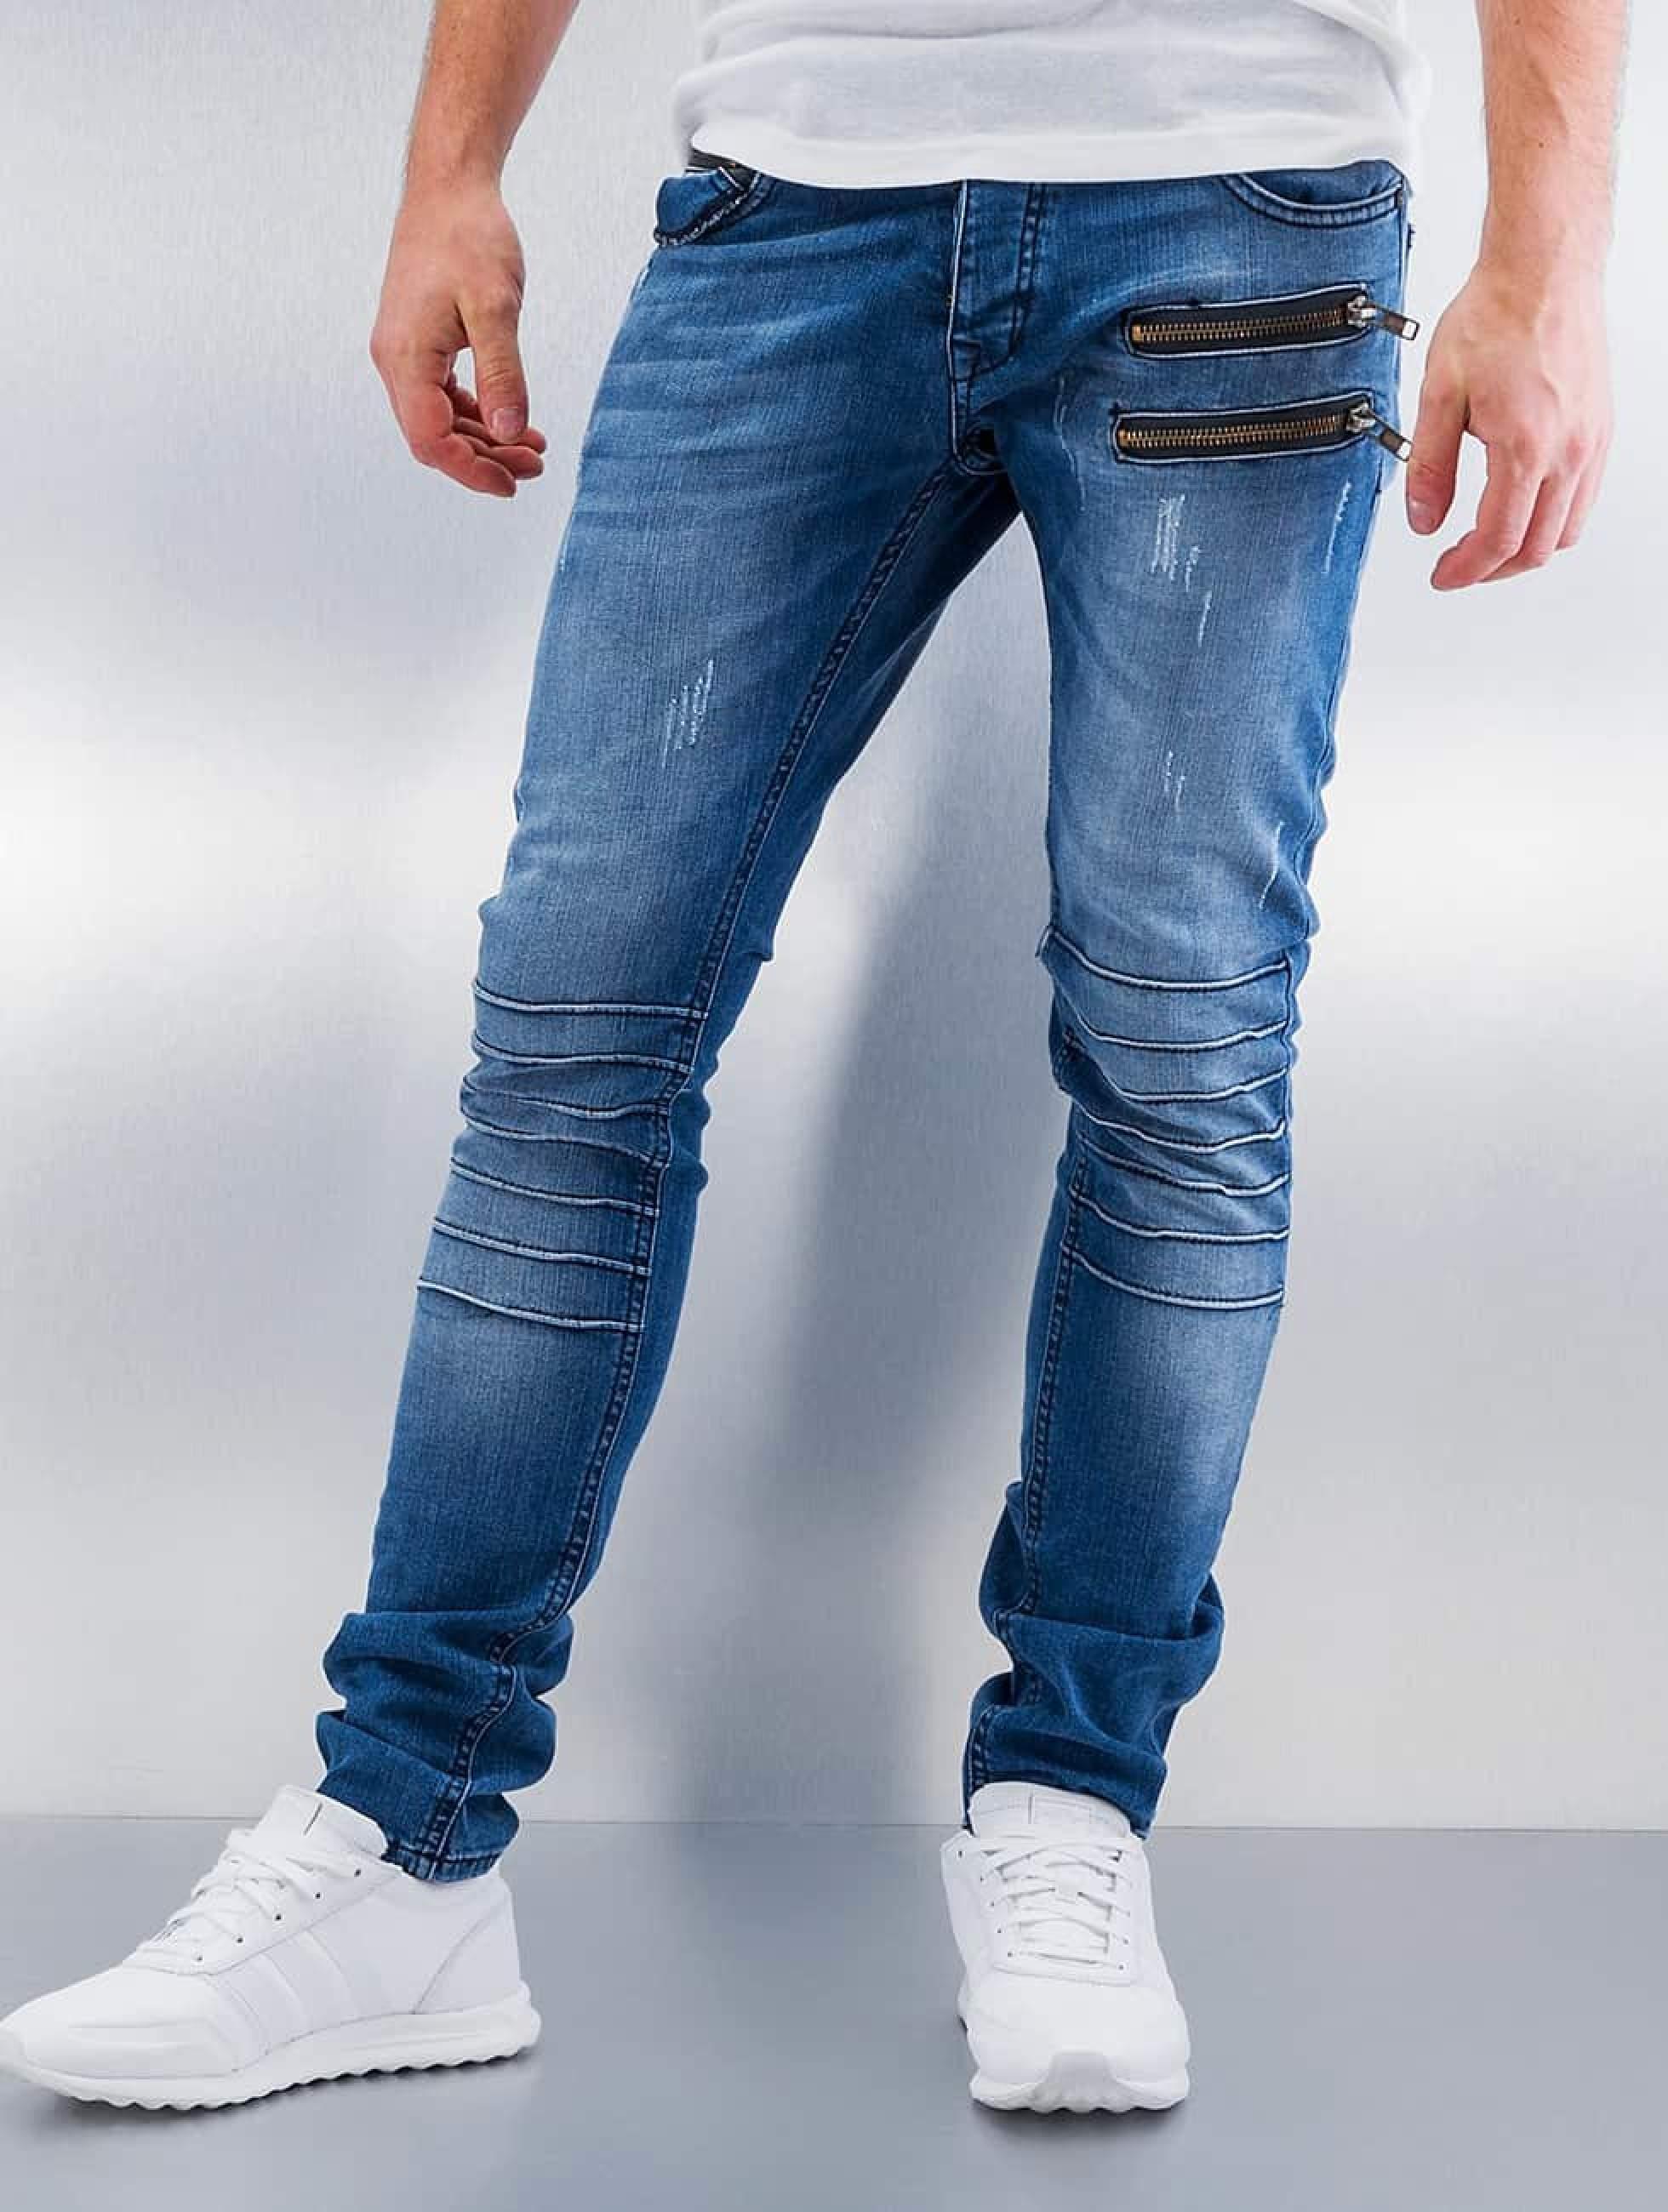 2Y / Skinny Jeans Sola in blue W 34